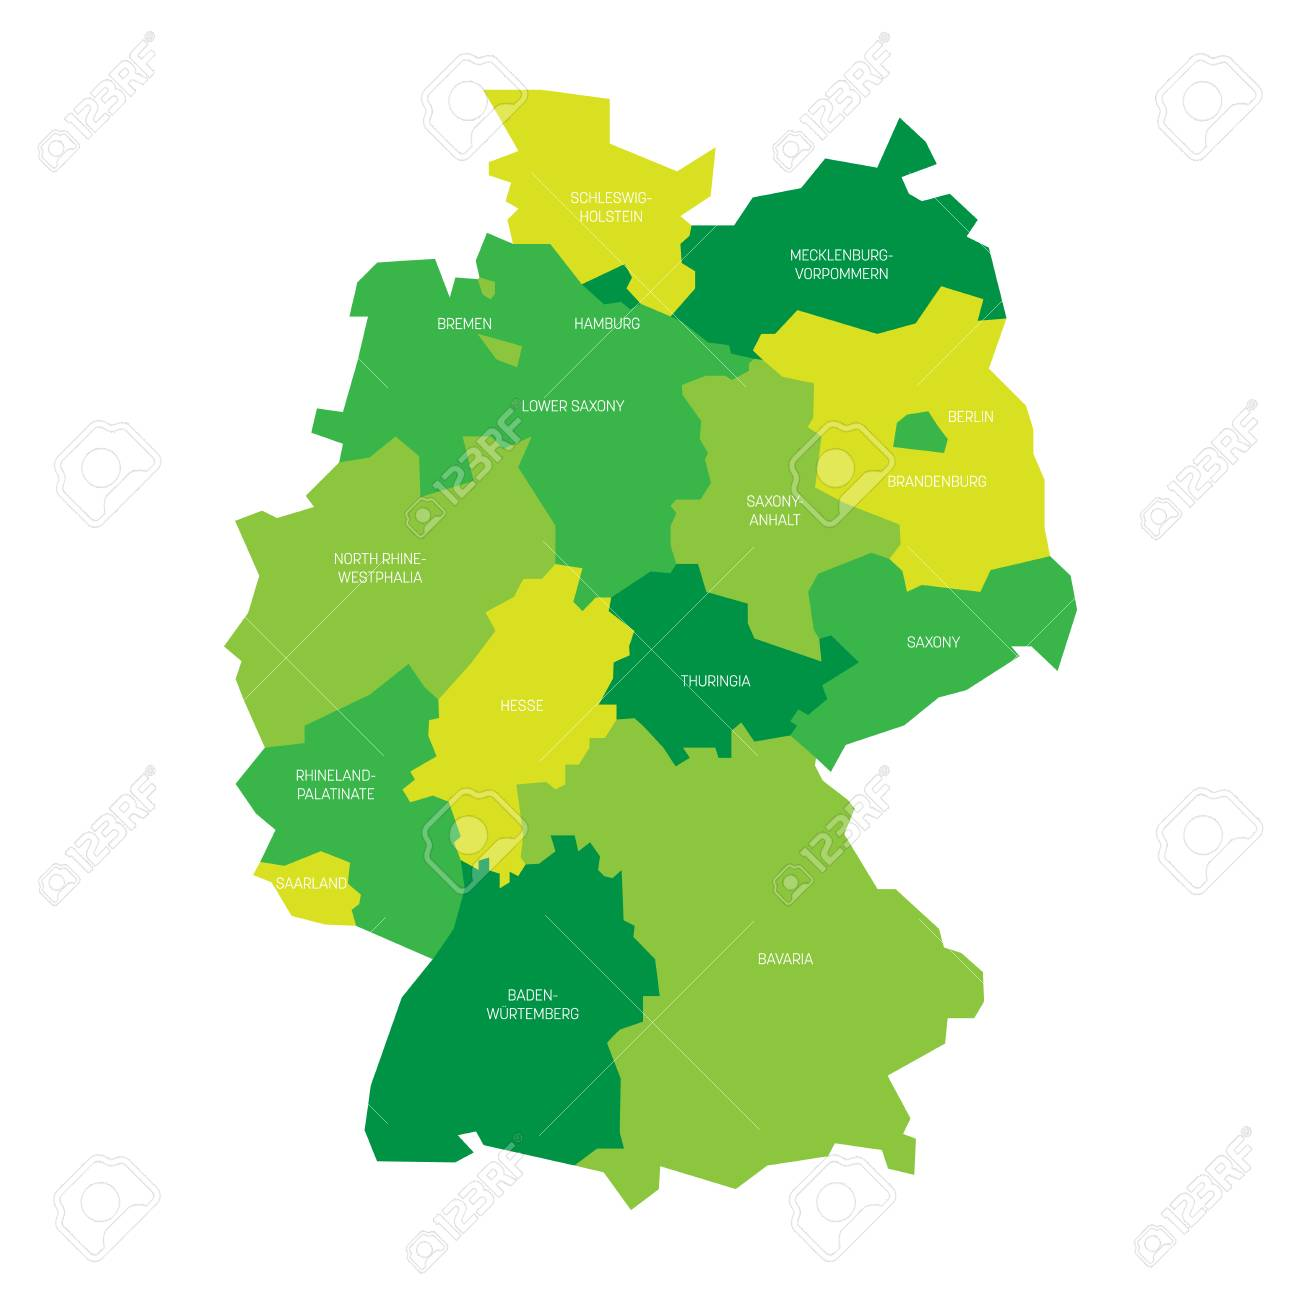 Deutschlandkarte Unterteilt In 13 Bundeslander Und 3 Stadtstaaten